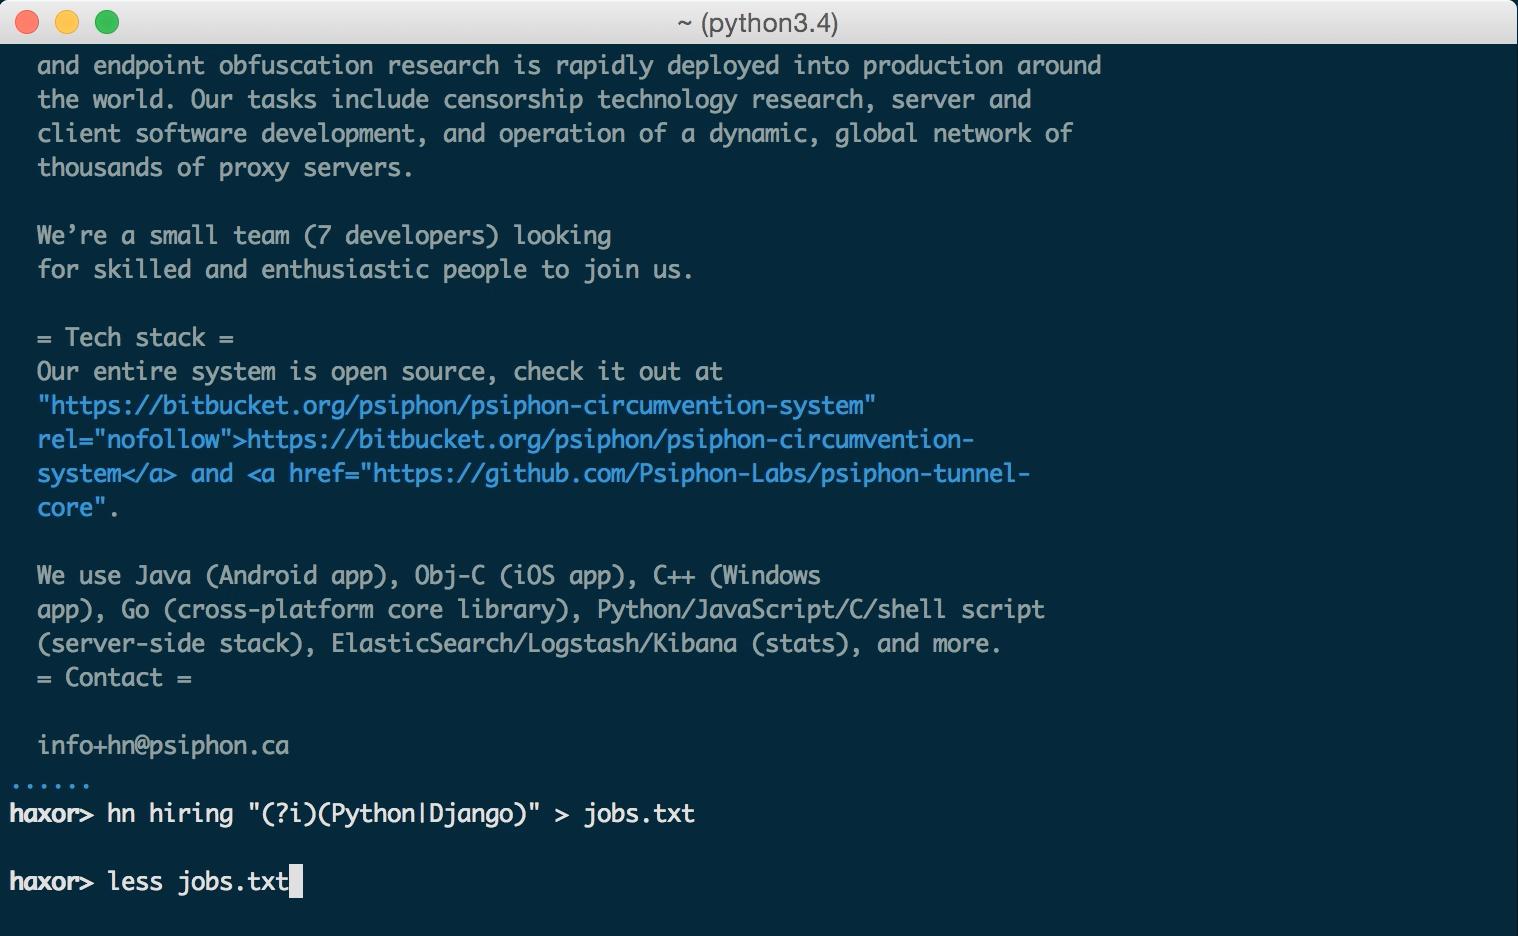 GitHub - donnemartin/haxor-news: Browse Hacker News like a haxor: A